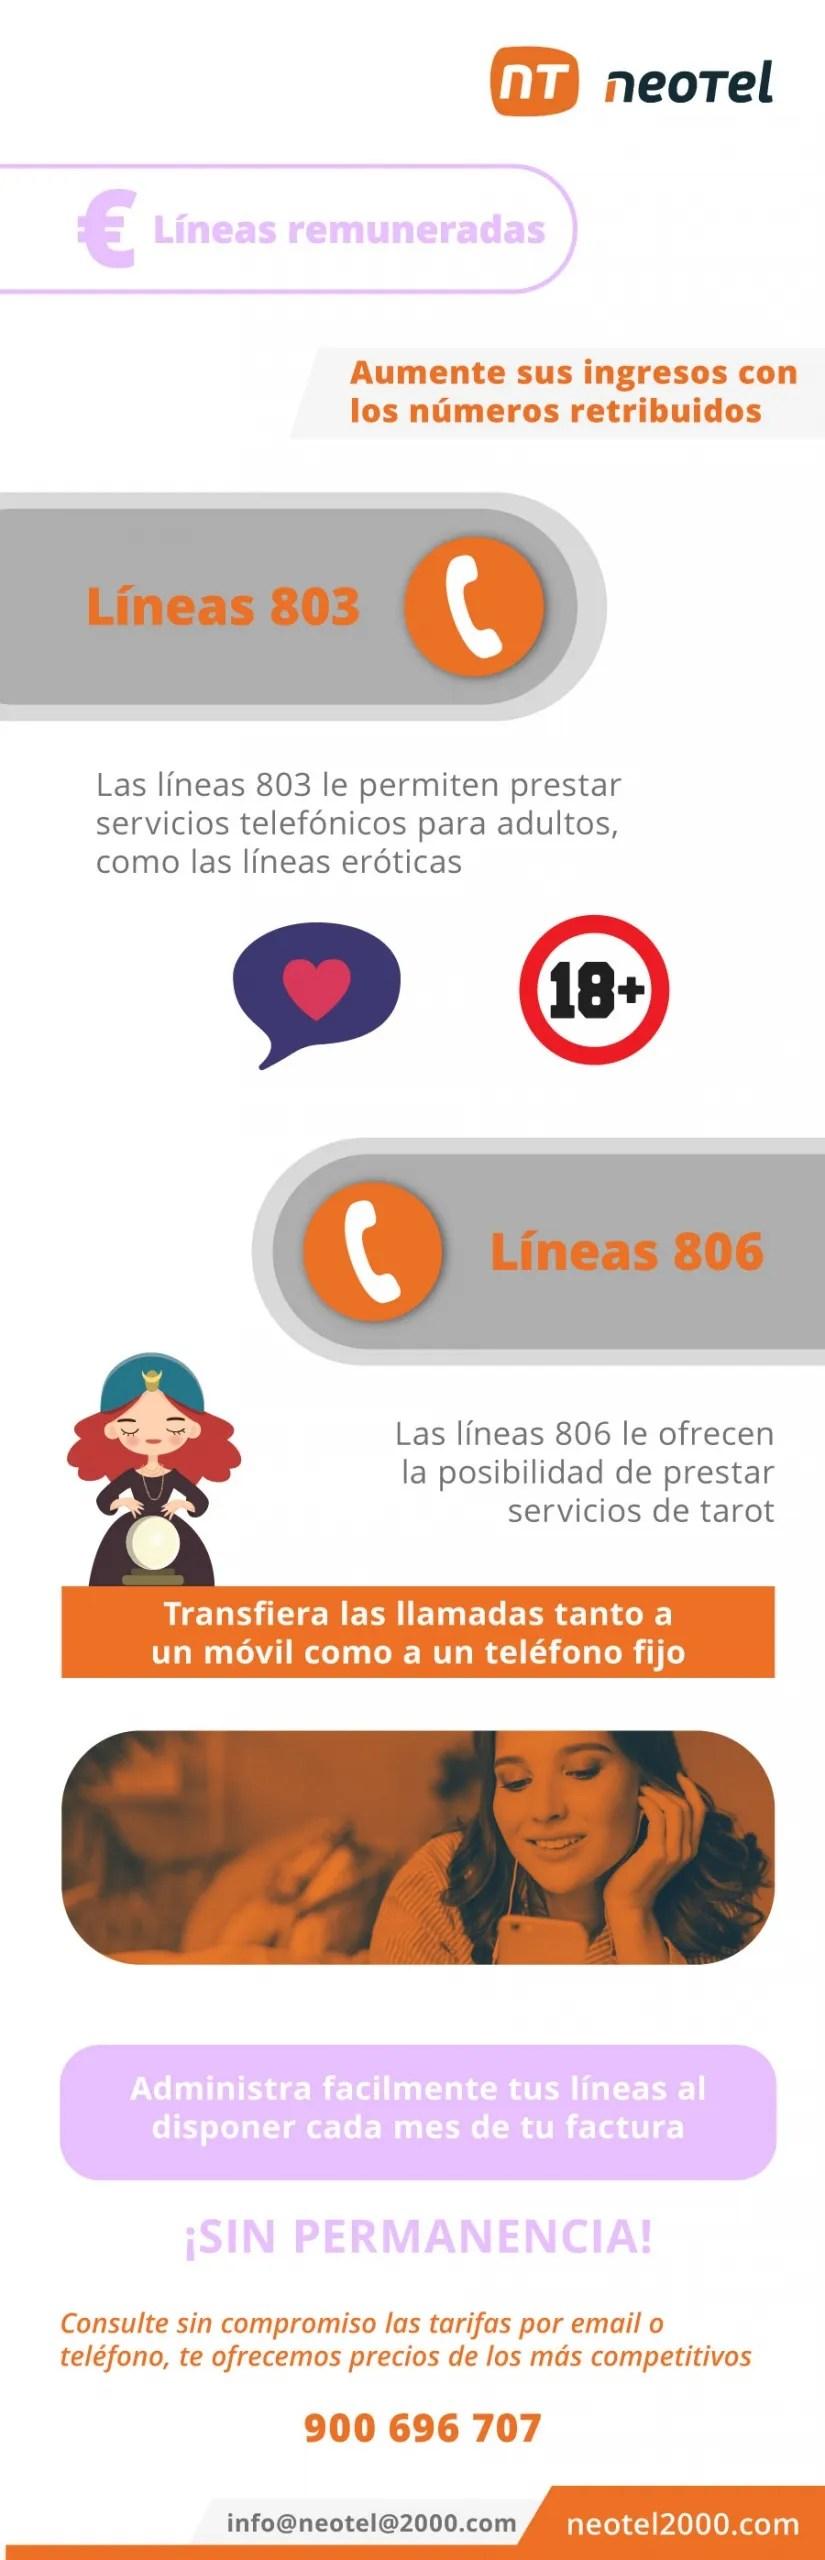 líneas 806 y líneas 803